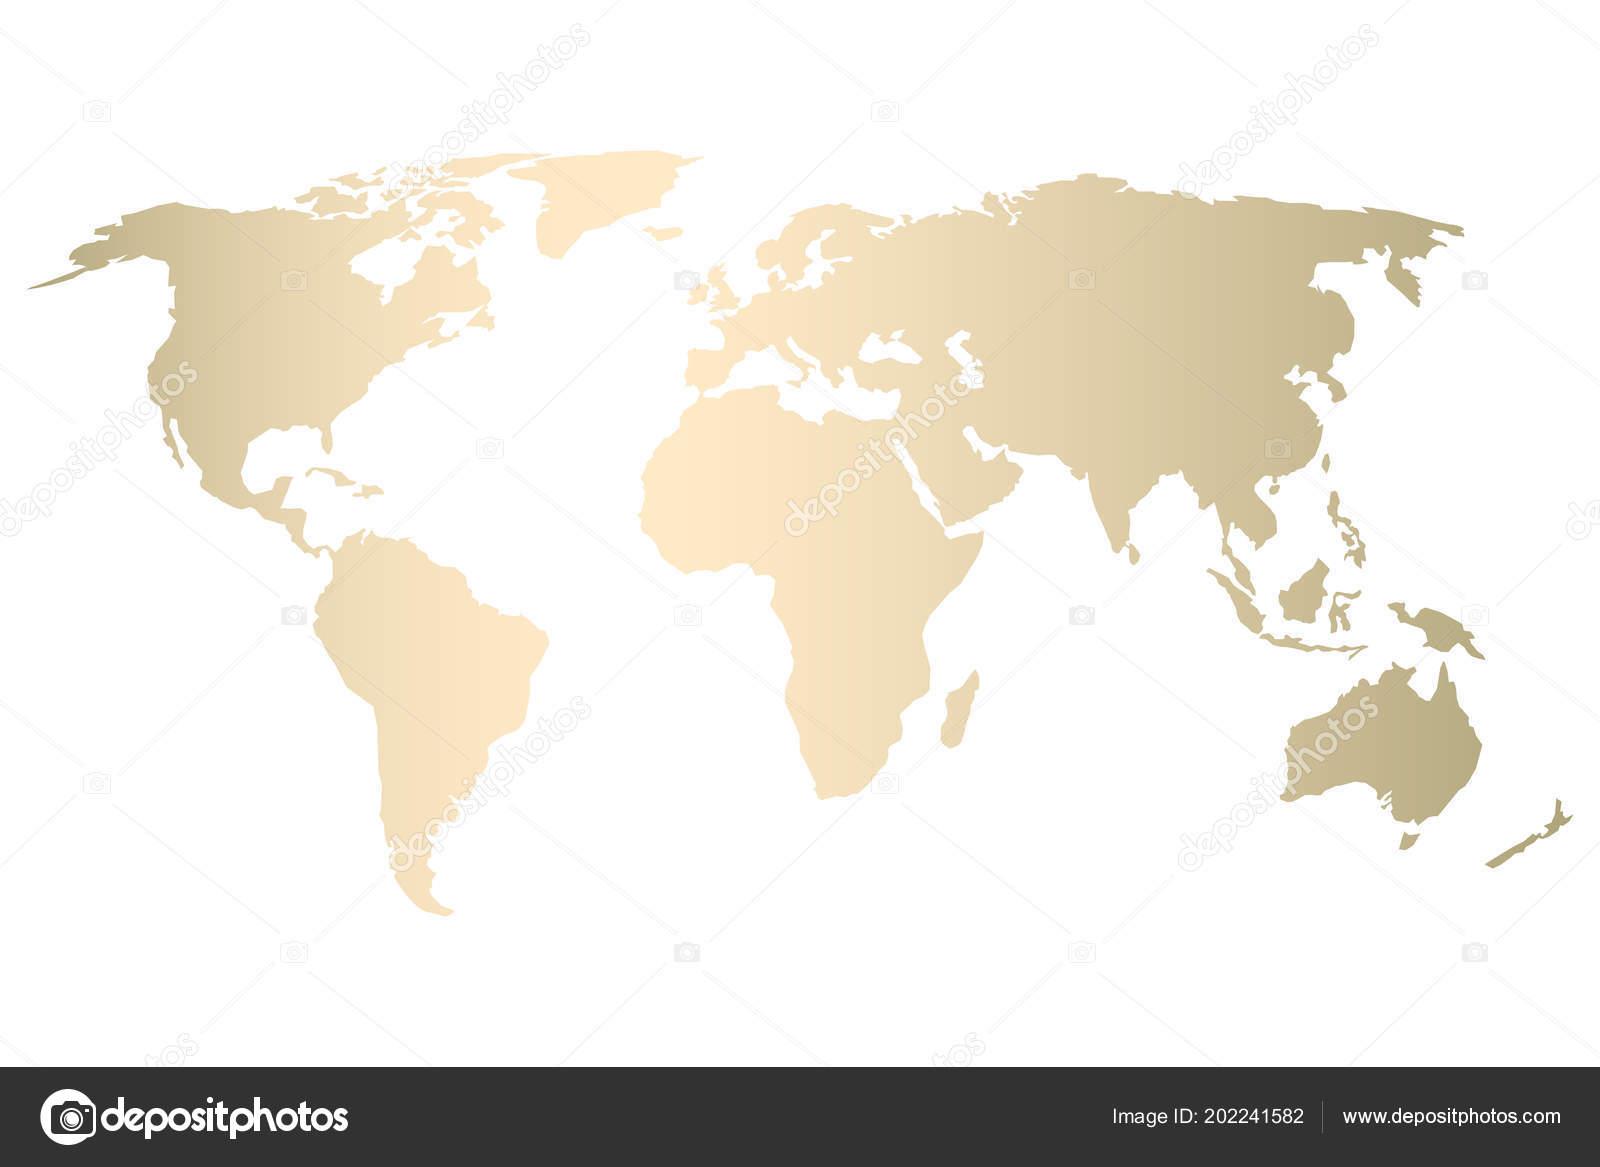 Modern Gold World Map Design Vector Trendy Design — Stock ... on map of greek world, map of prehistoric world, map of roman world, map of buddhist world, map of black world, map of clean world, map of political world, map of developed world, map of digital world, map of colonial world, map of western world, map of old world, map of beautiful world, map of once upon a time, map of islamic world, map of medieval world, map of the classical world, map of ancient world, map of rural area, india modern world,